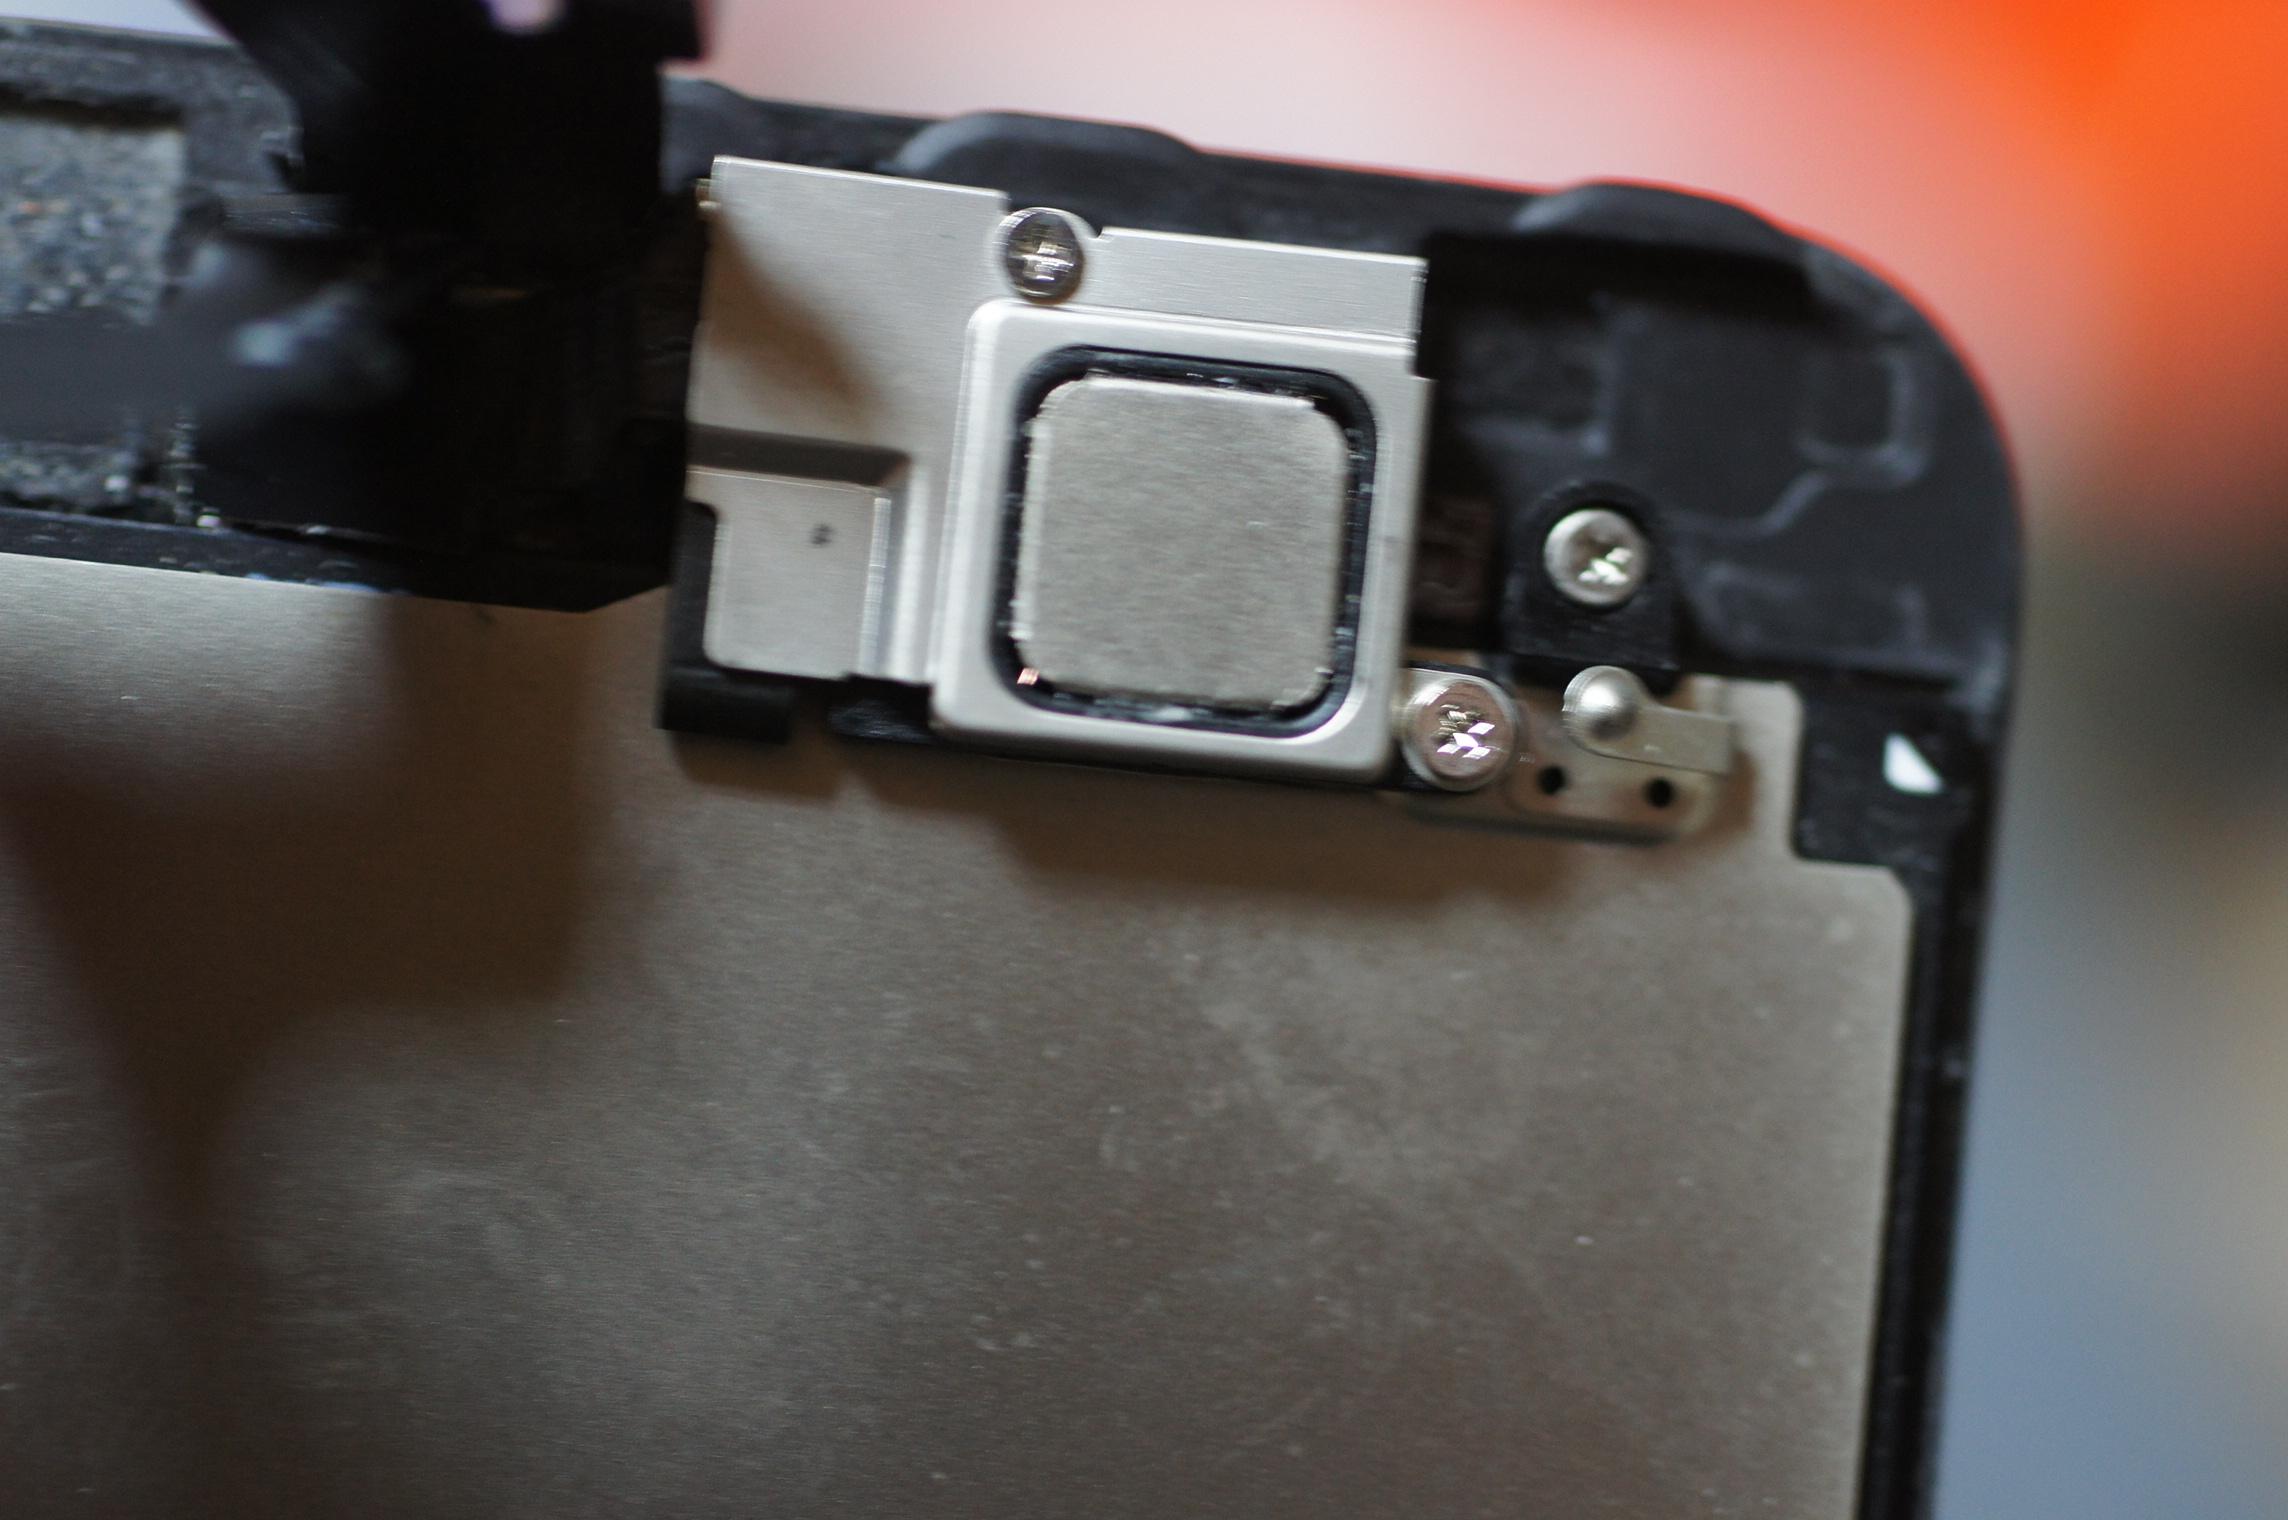 iPhone5 インカメラのホコリ取り